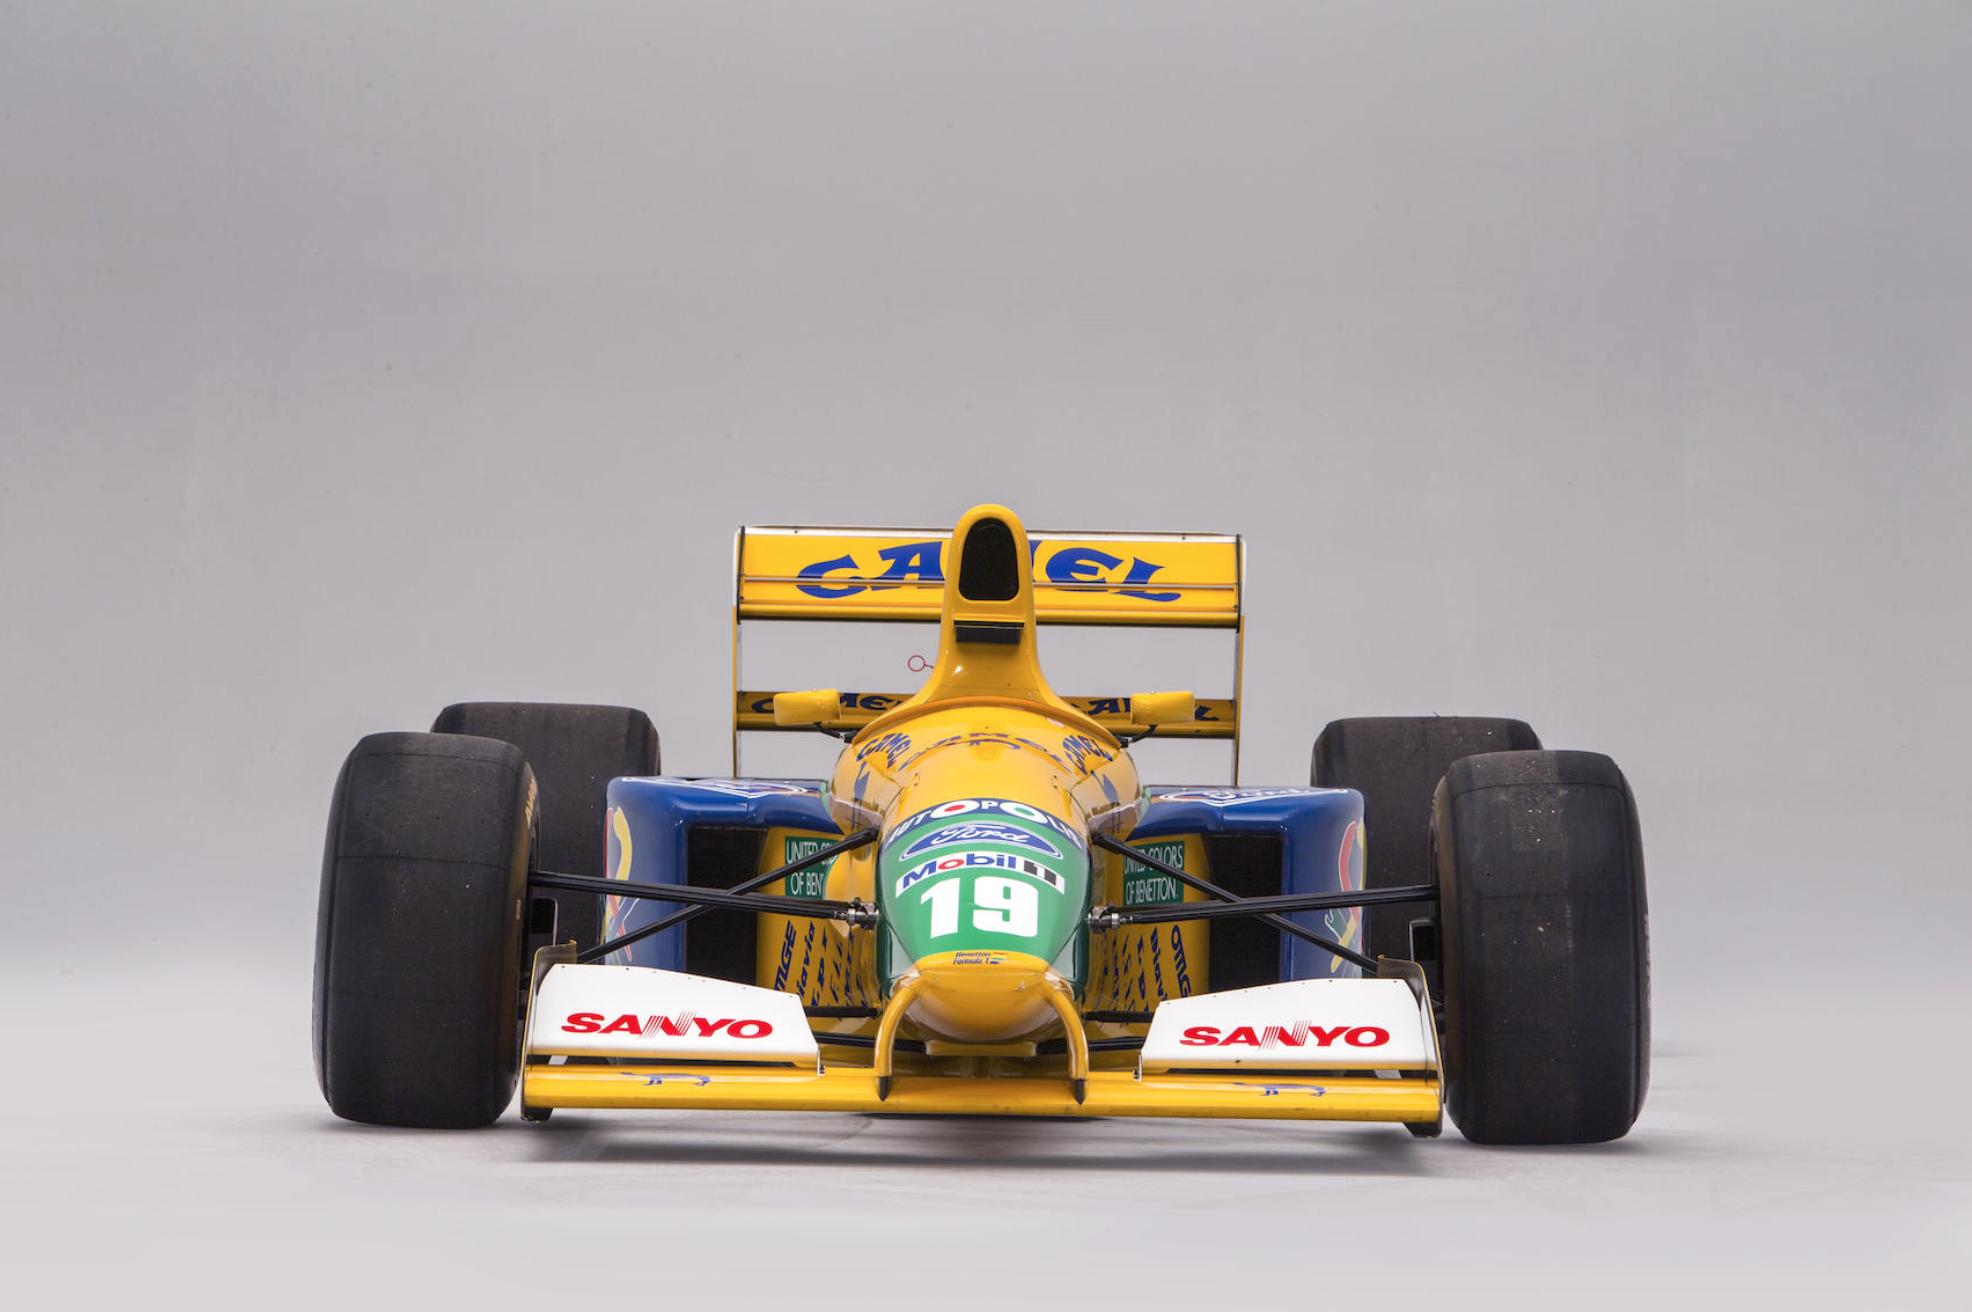 Benetton-Ford B191B-06 Michael Schumacher - Bonhams - Autovisie.nl - 1